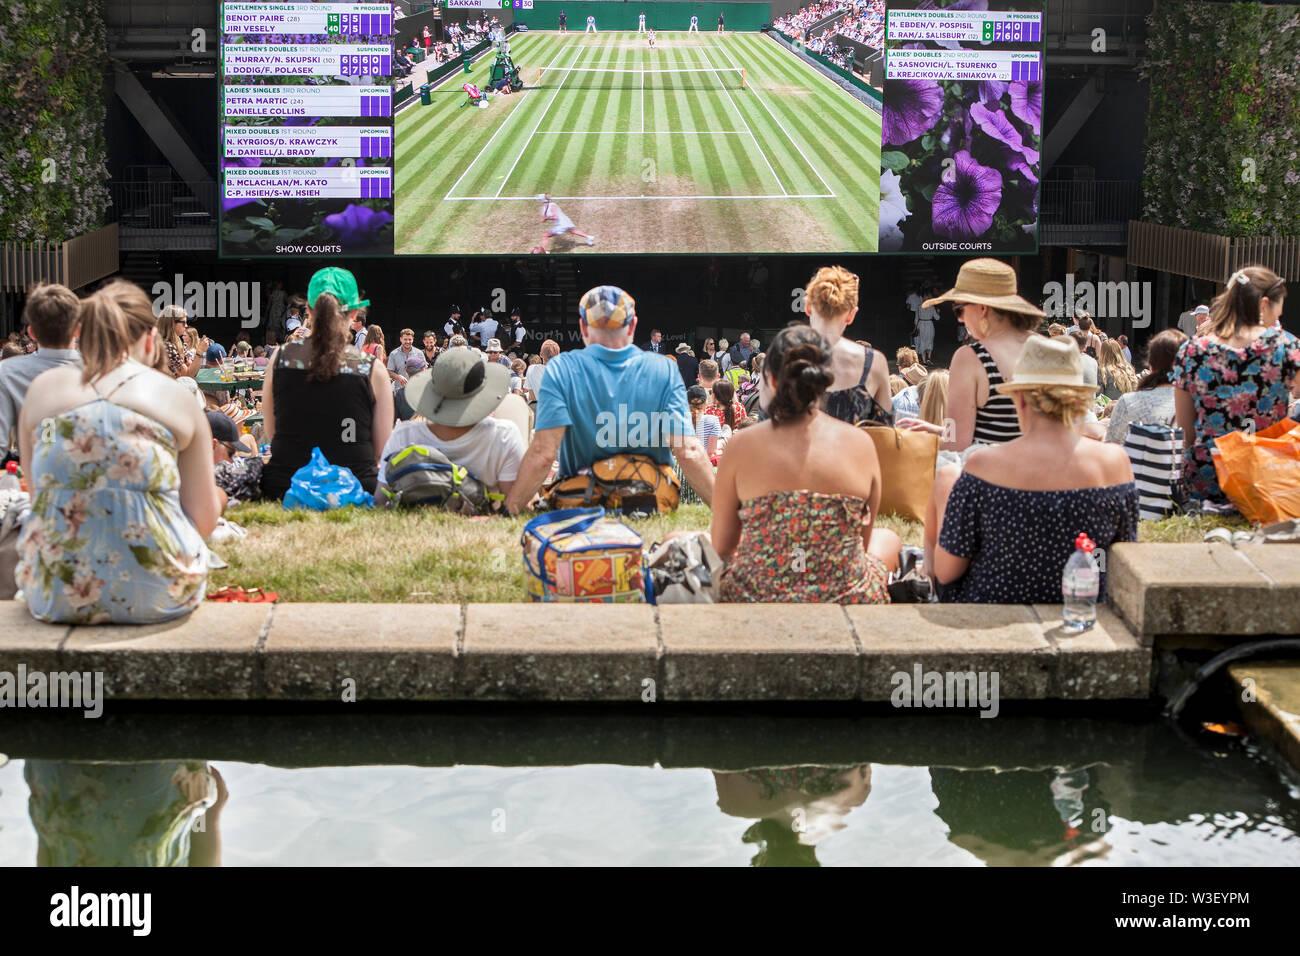 2019 Wimbledon spectators watching big screens from Henman hill / Murray mount ,carp pond foreground Stock Photo